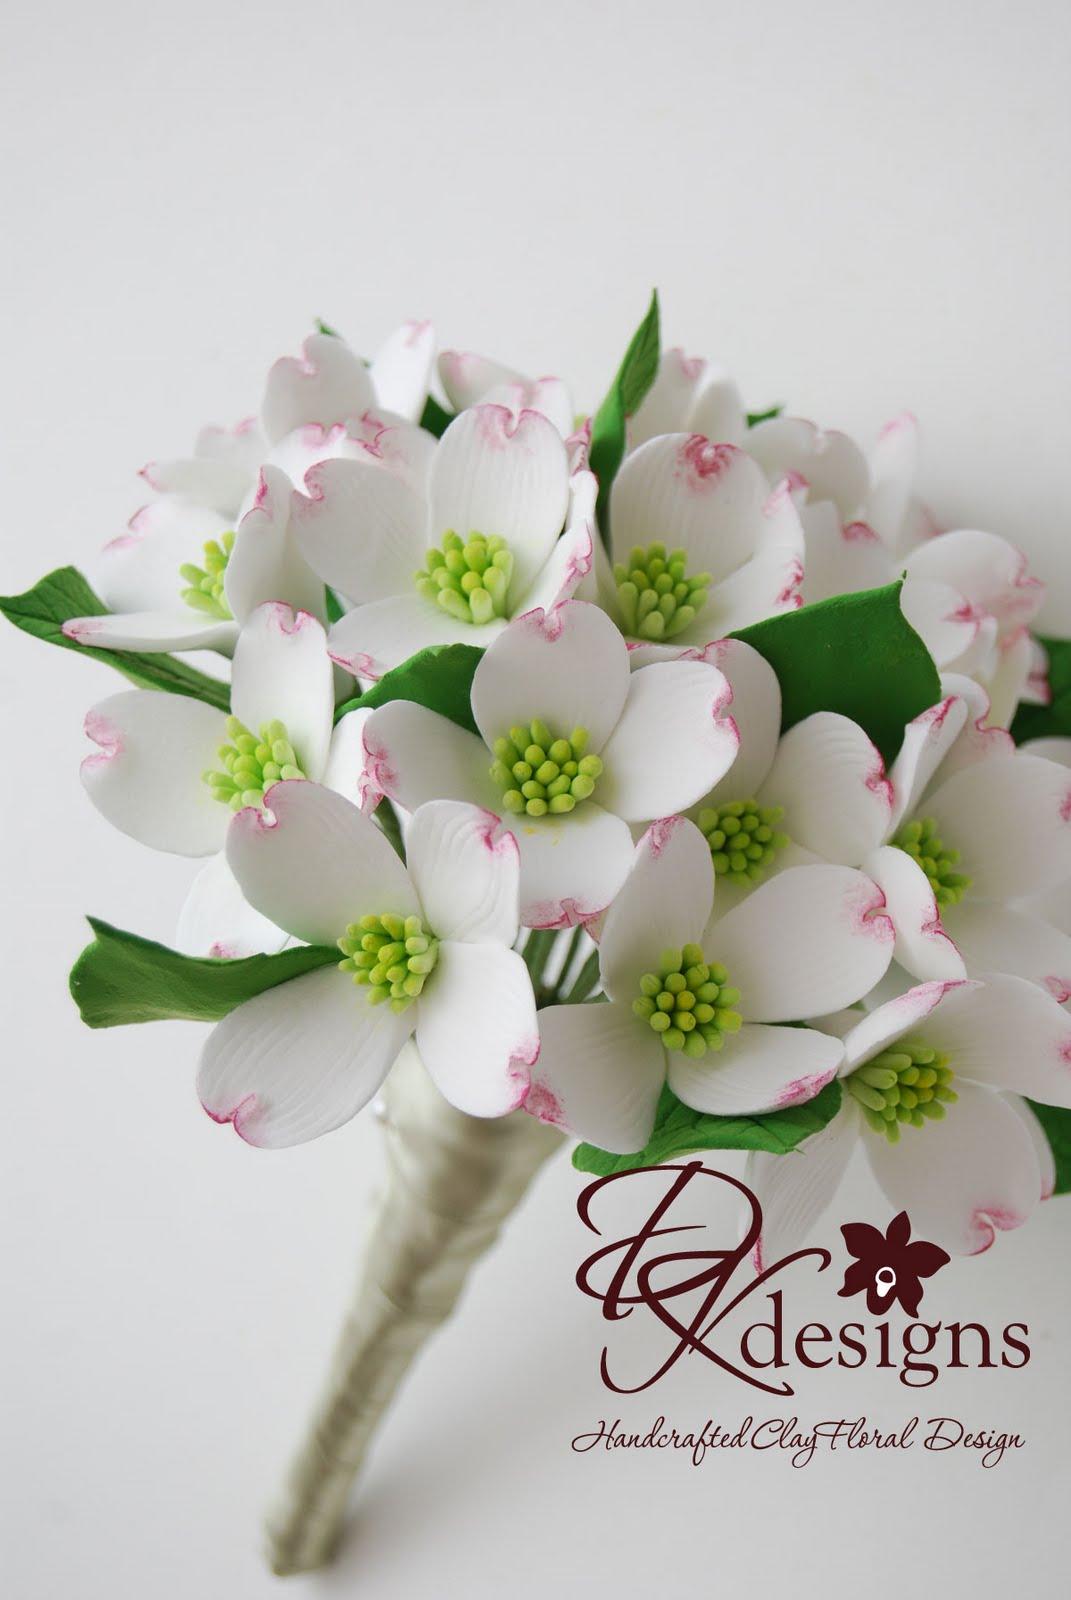 Dogwood Flower Order - DK Designs